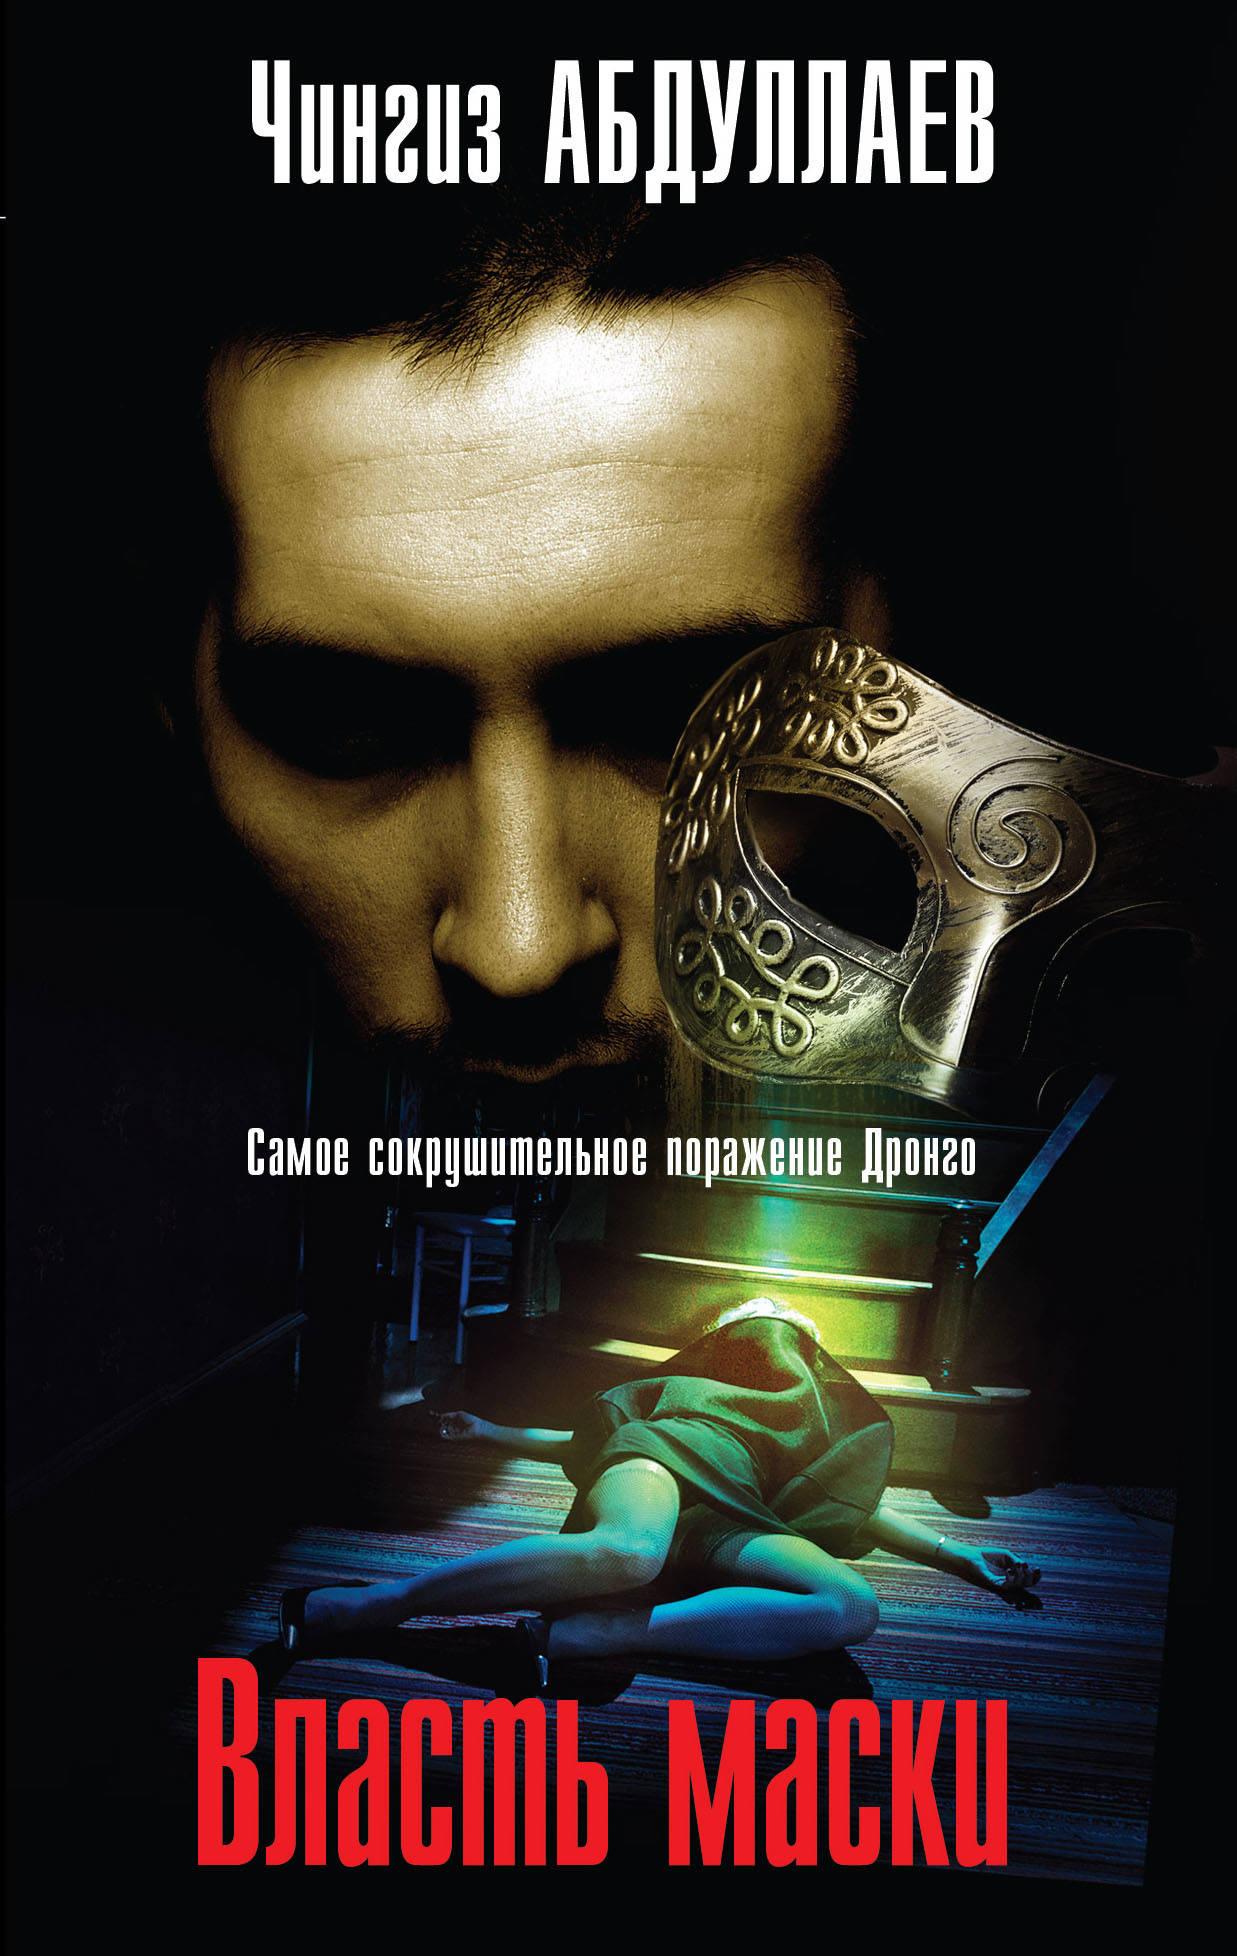 Чингиз Акифович Абдуллаев Власть маски абдуллаев чингиз акифович связной из багдада